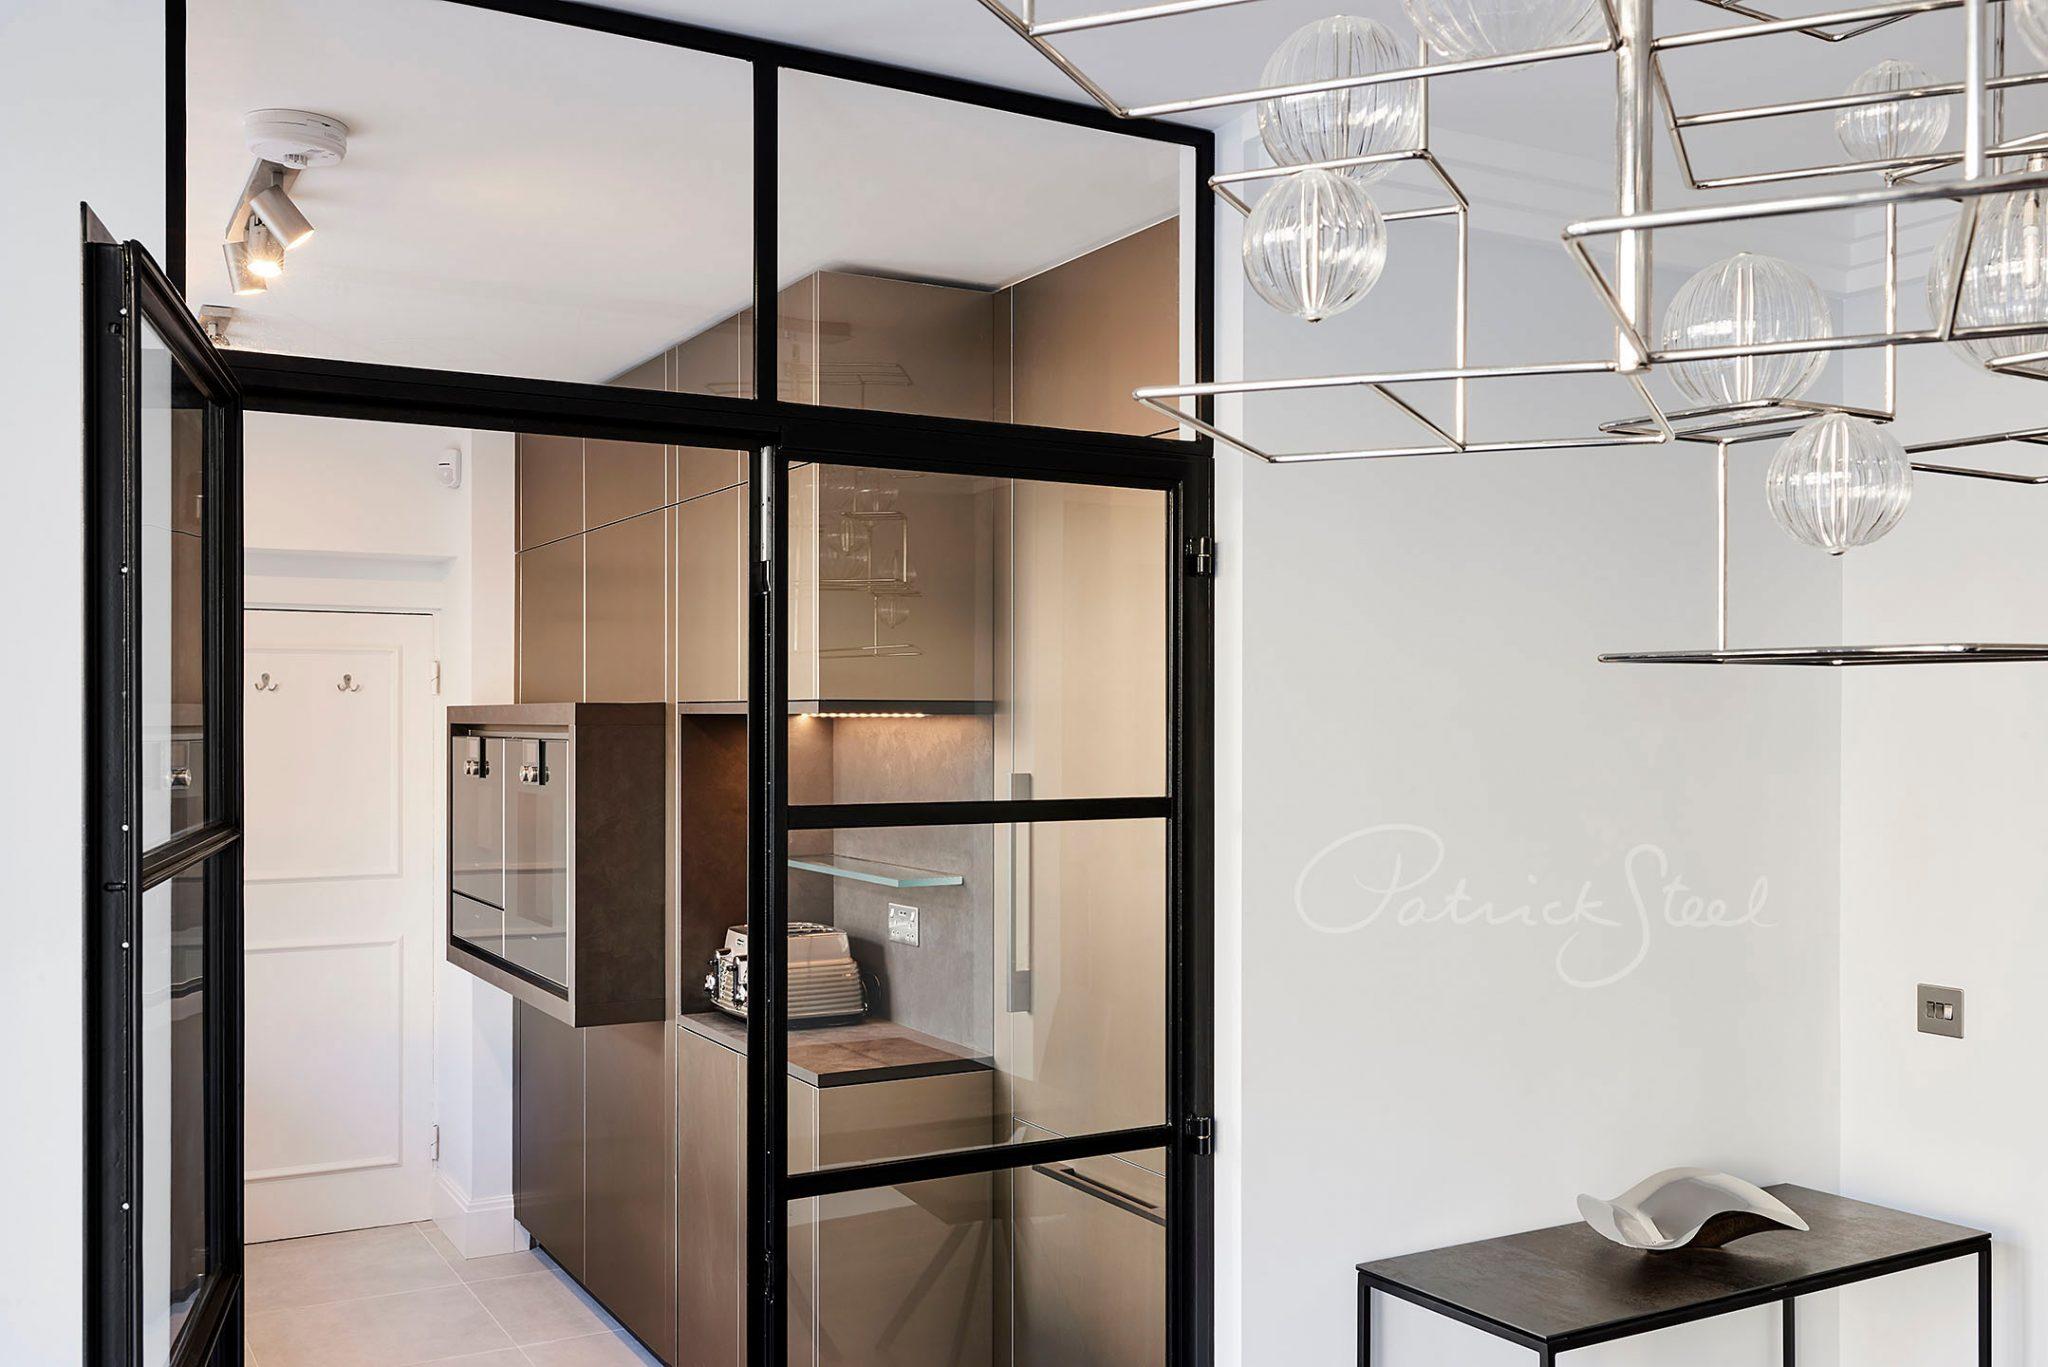 Mr Steel | Hill Street, Mayfair | Interior design by Rupinder Gidar